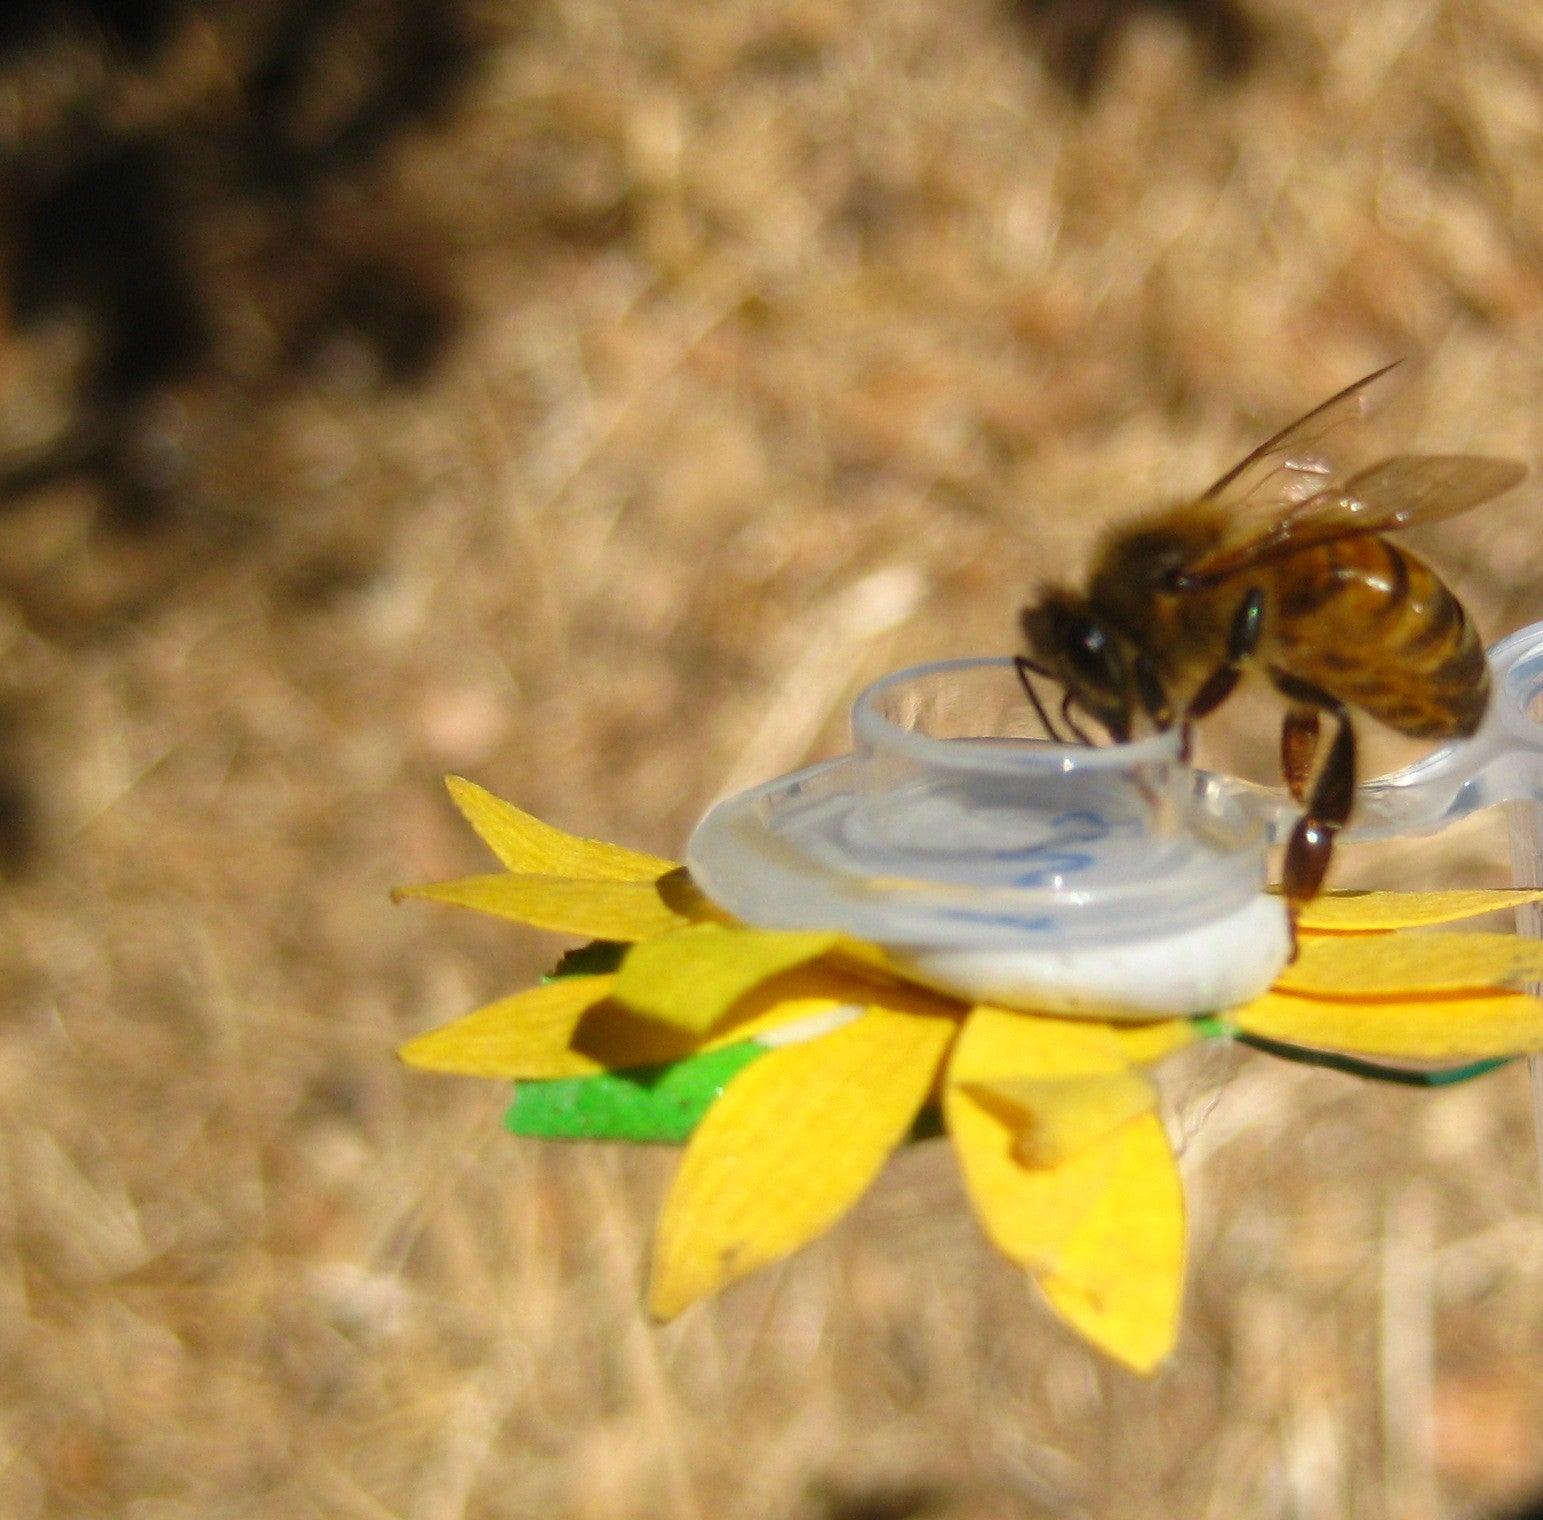 Apis mellifera foraging on experimental nectar